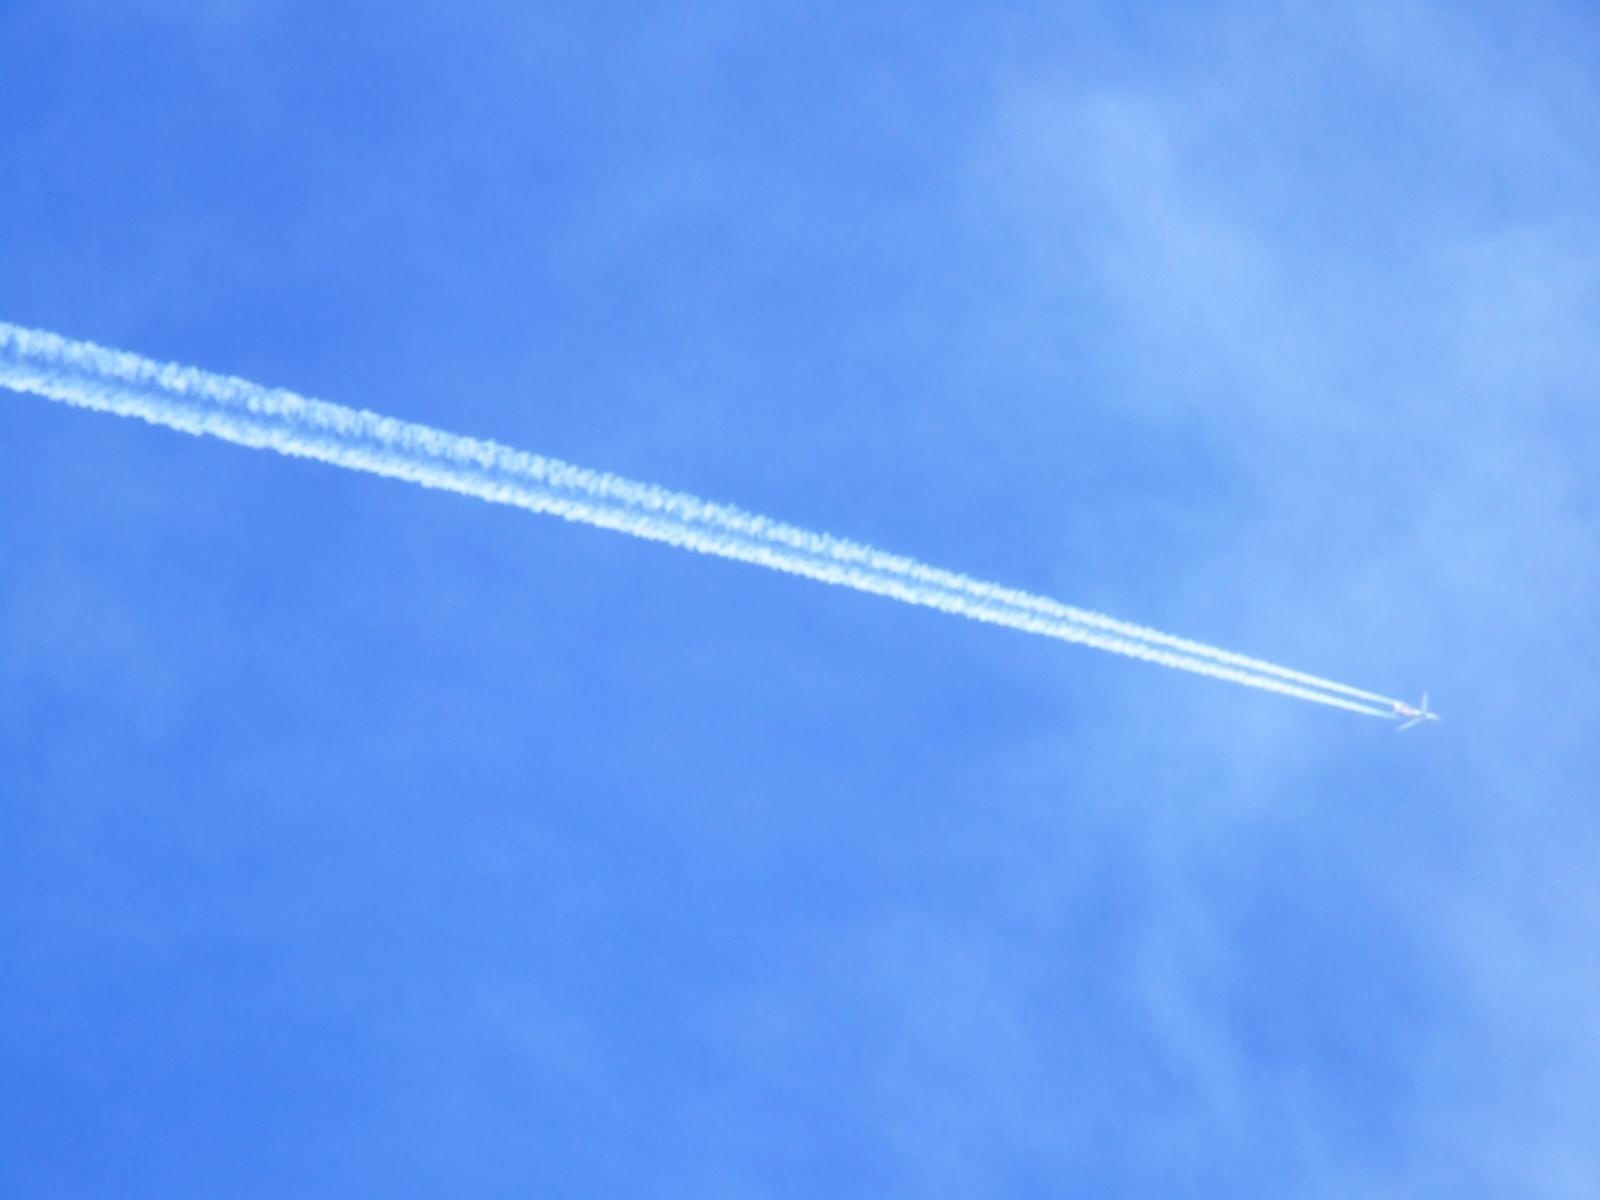 Aeroplane trail